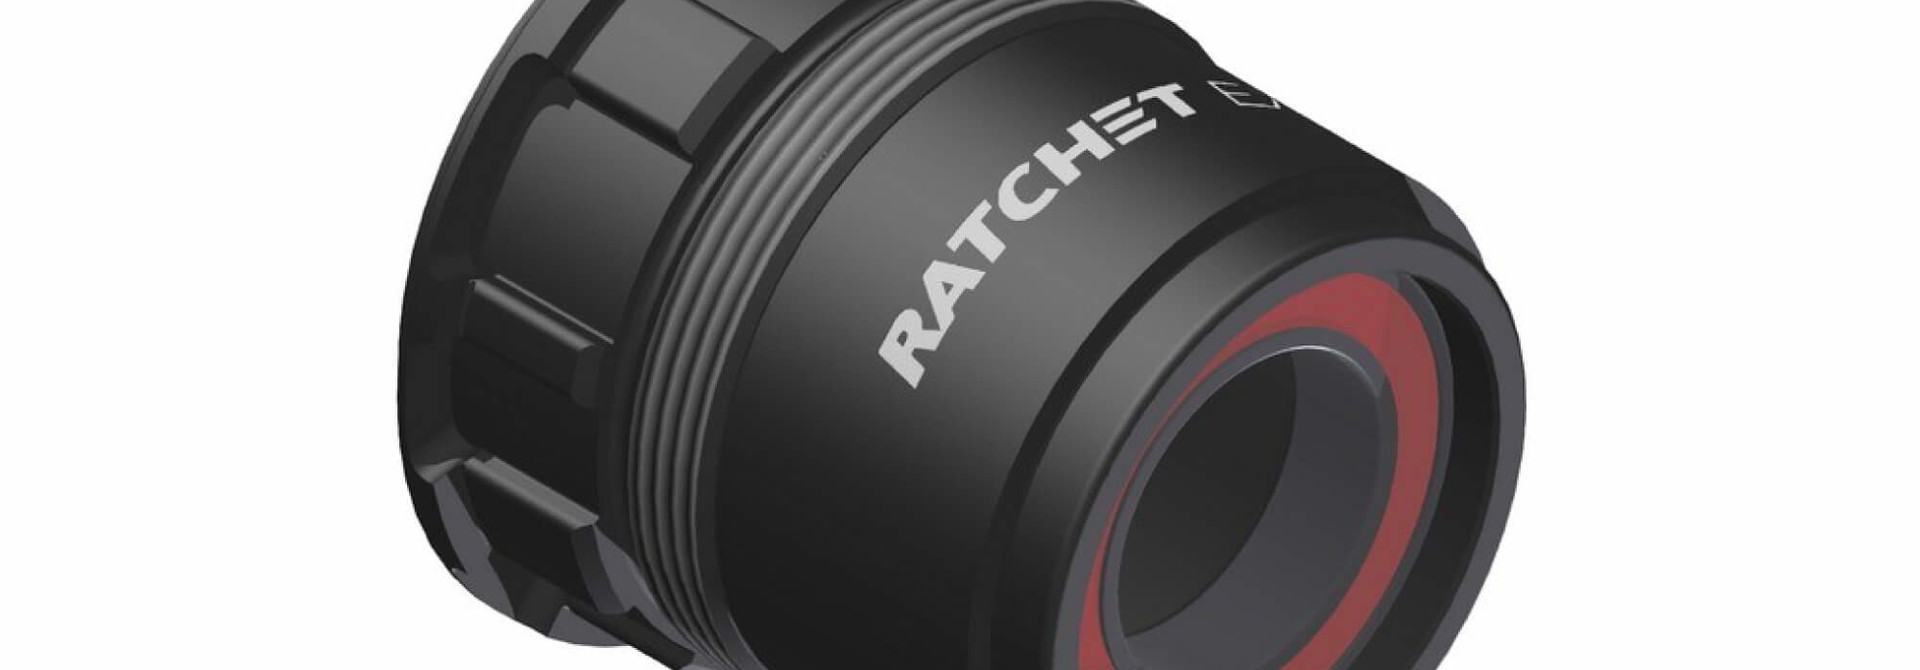 Rotor Ratchet Exp Sram XDR